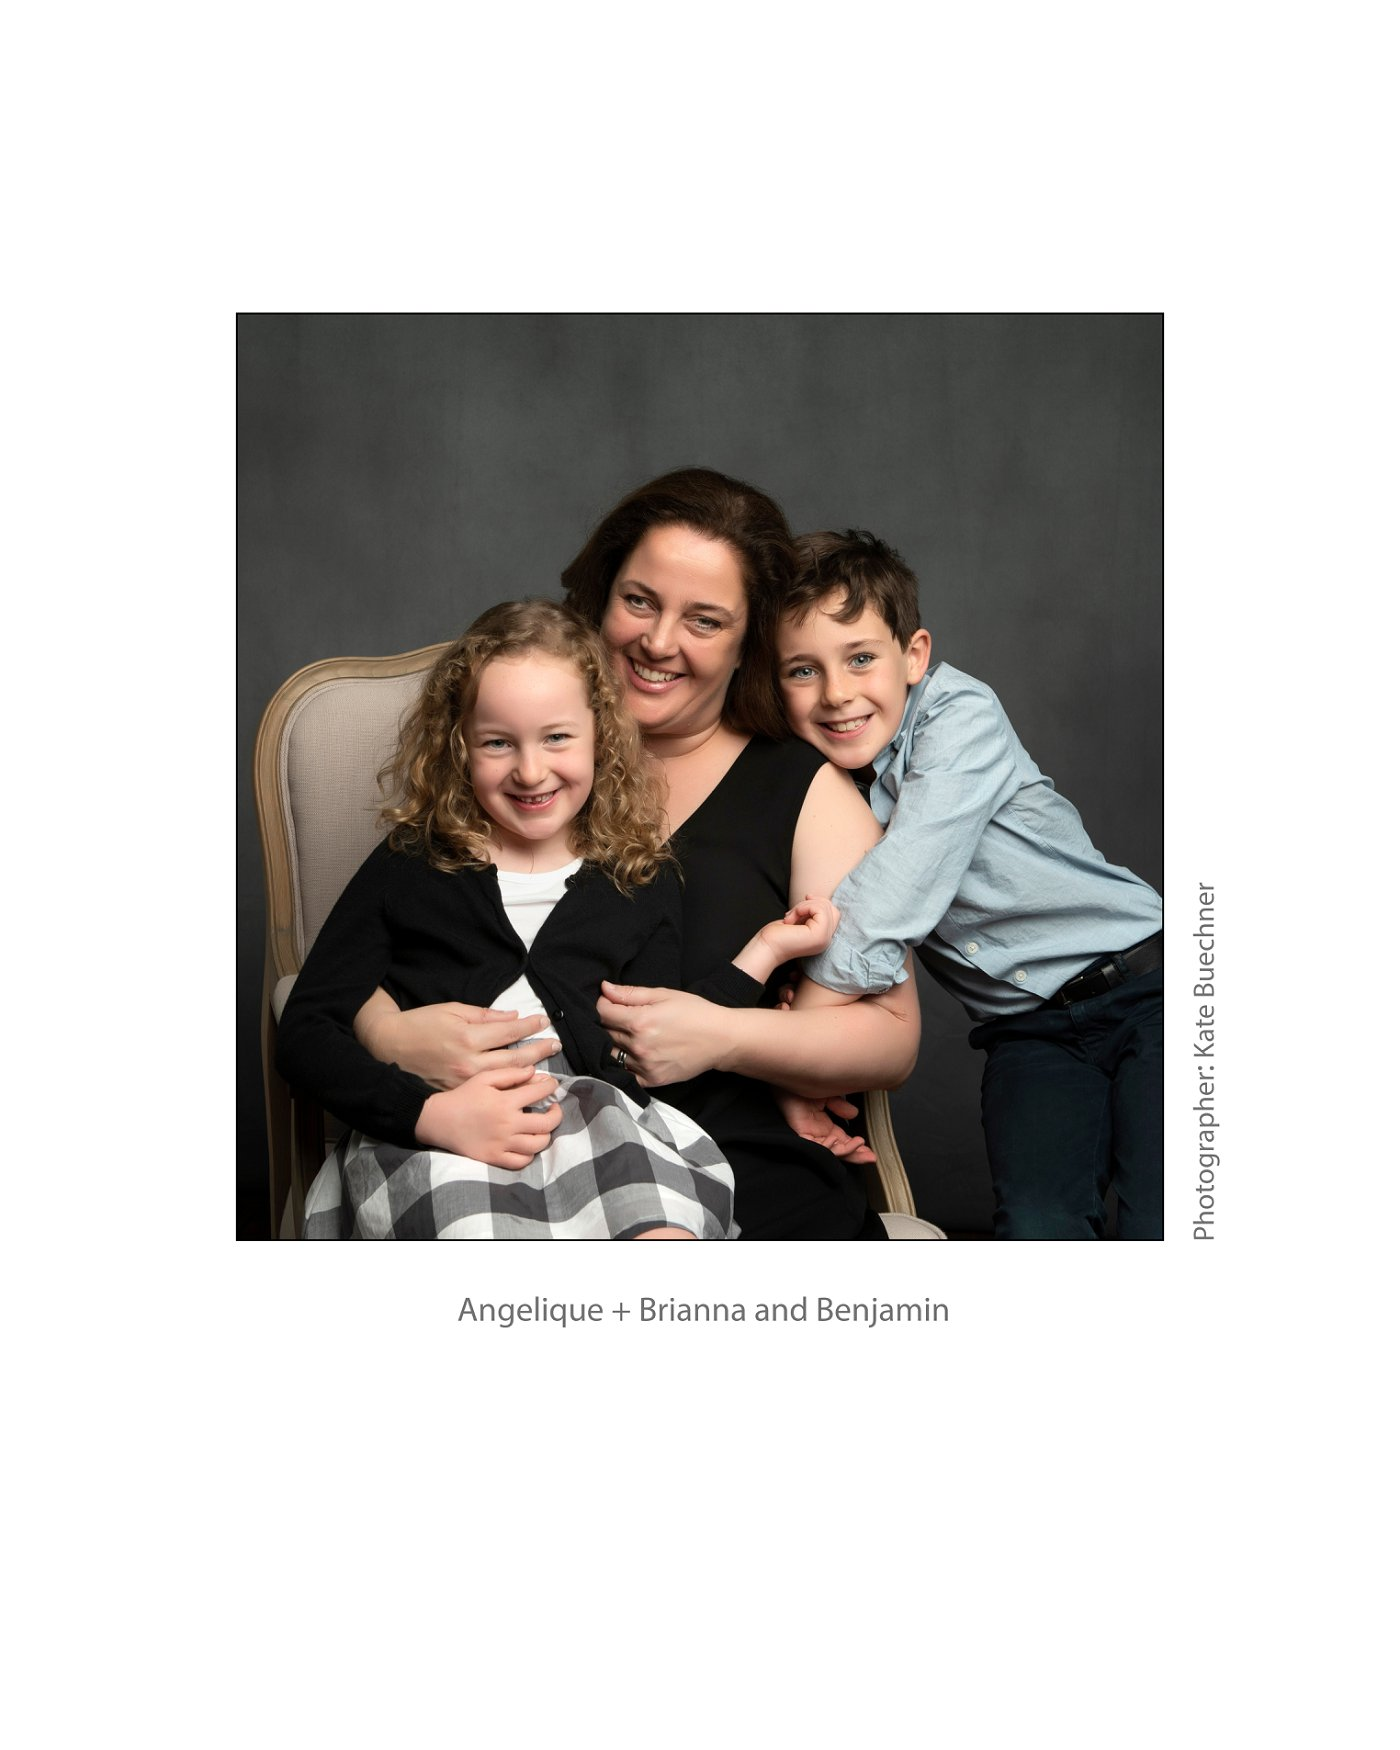 family-photographer-sydney (6).jpg